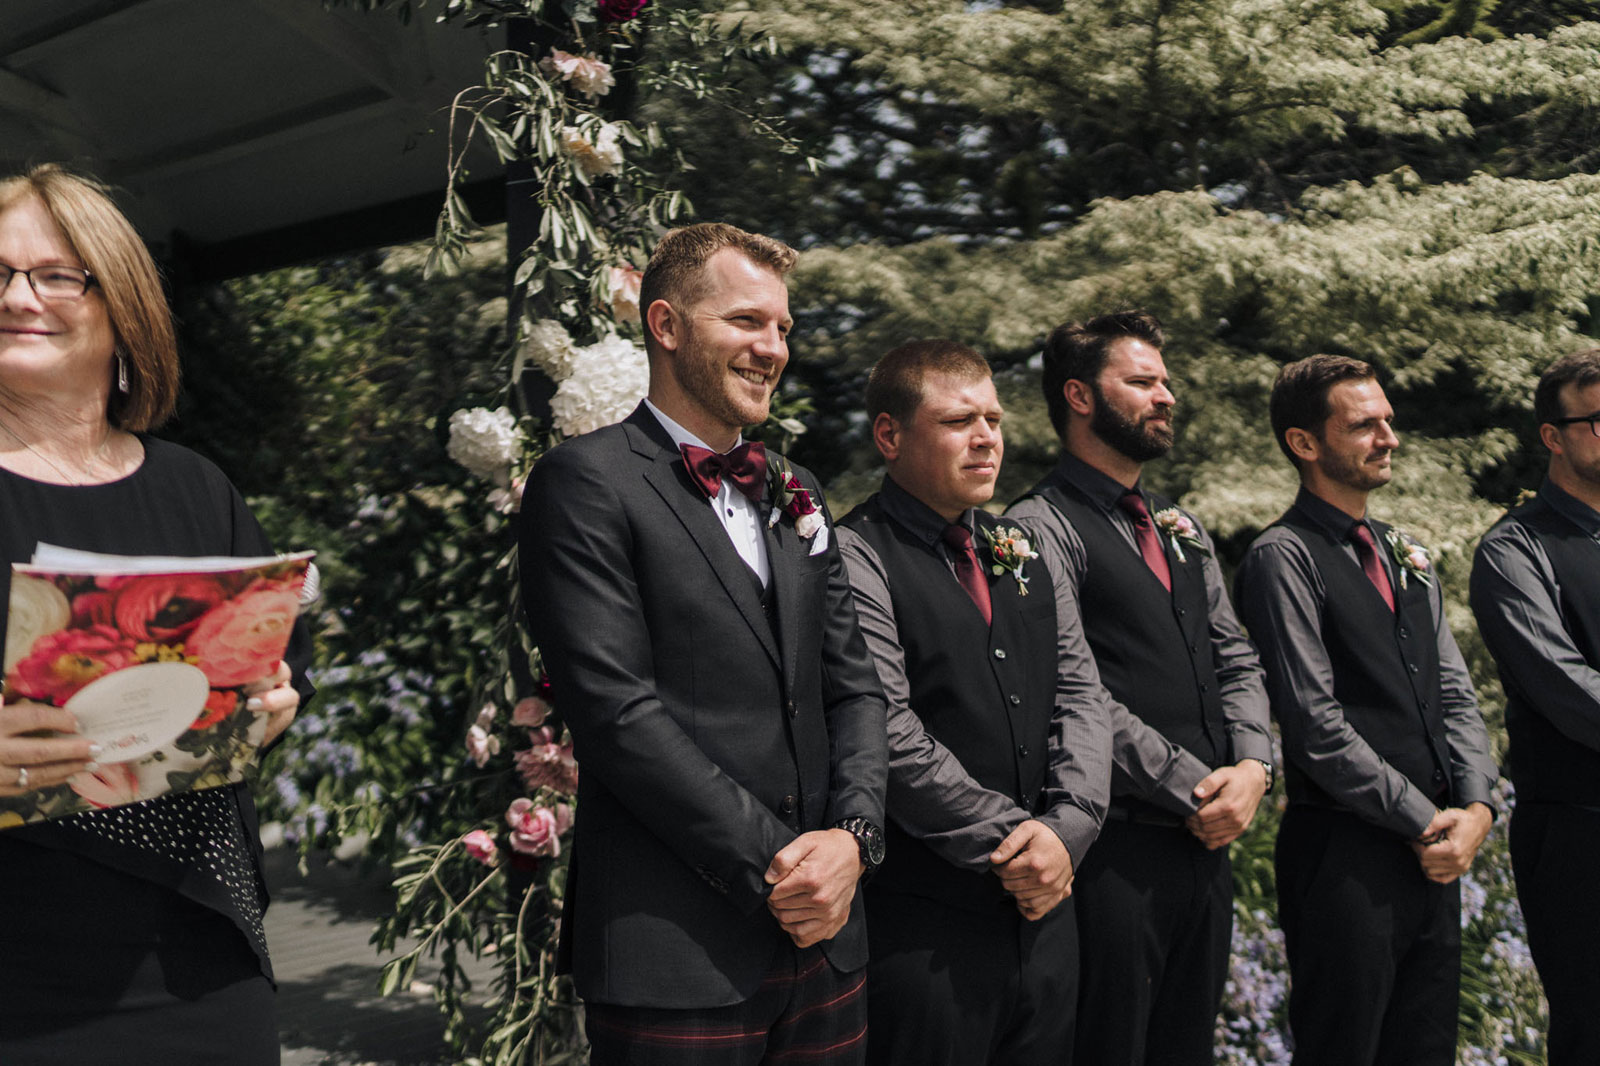 newfound-n-c-olive-tree-cottage-tauranga-wedding-photographer-394